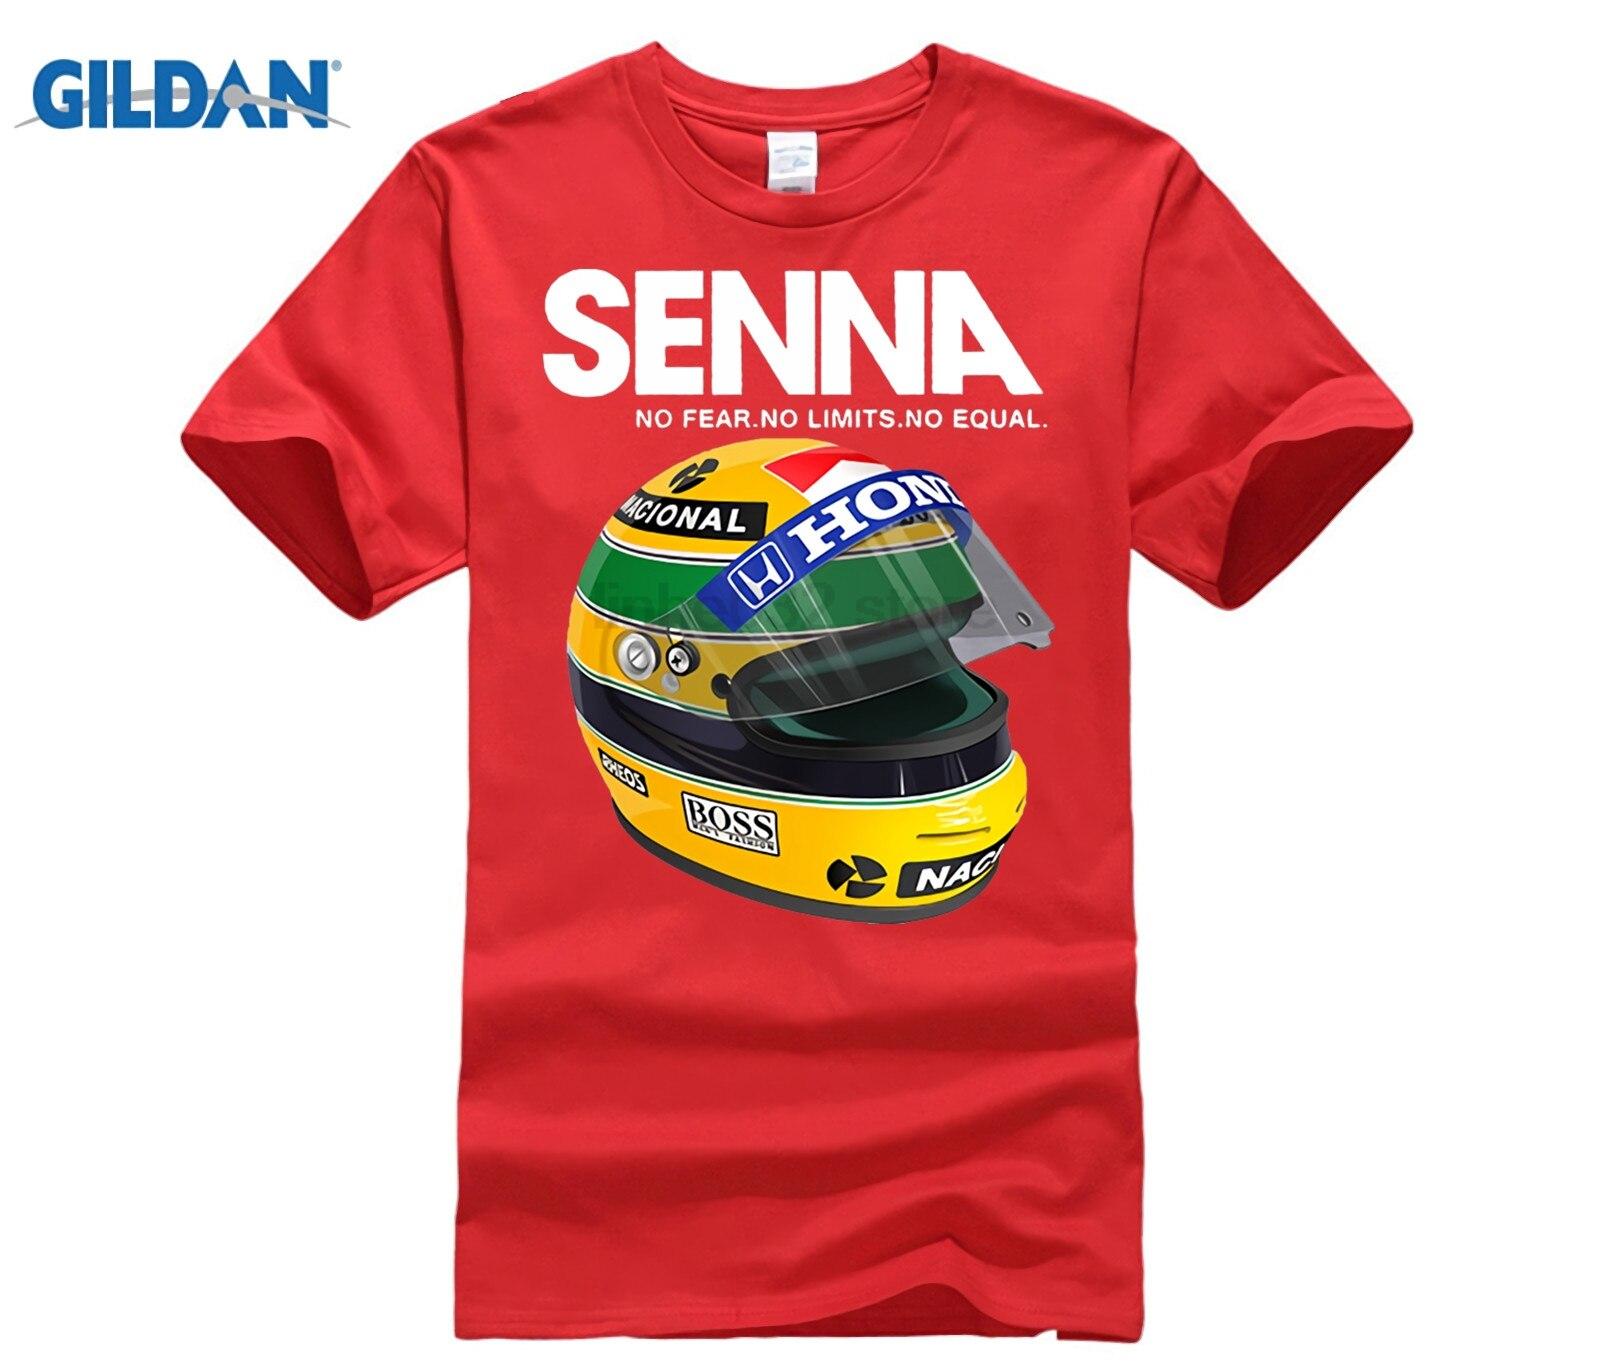 ayrton-font-b-senna-b-font-helmet-tee-tops-clothing-1-race-car-man-crew-neck-short-sleeve-t-shirt-popular-man-big-size-t-shirt